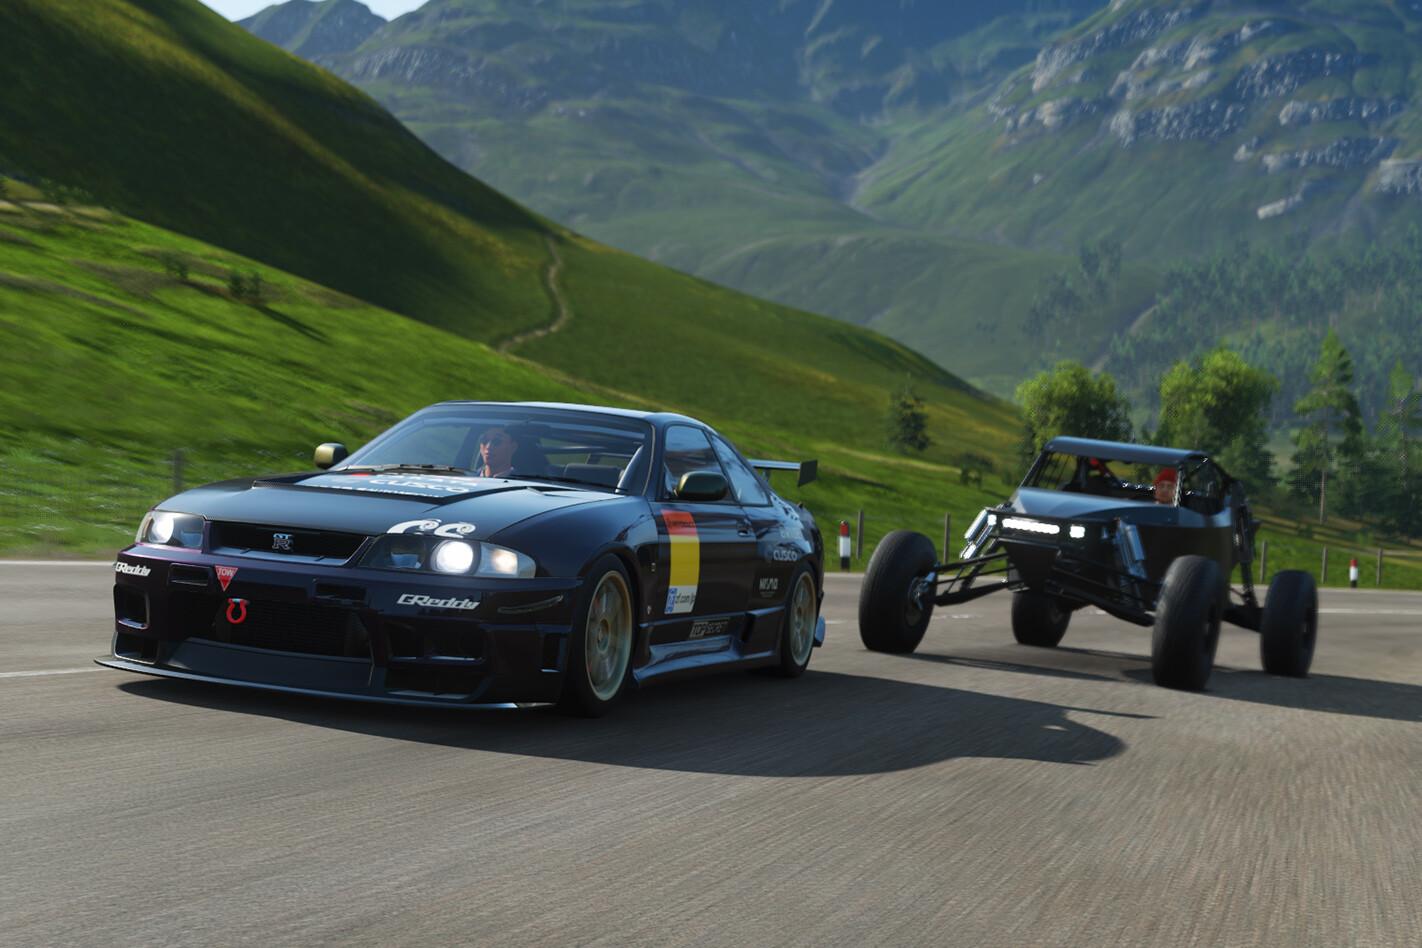 Forza Horizon 4 Nissan Skyline R33 GT-R